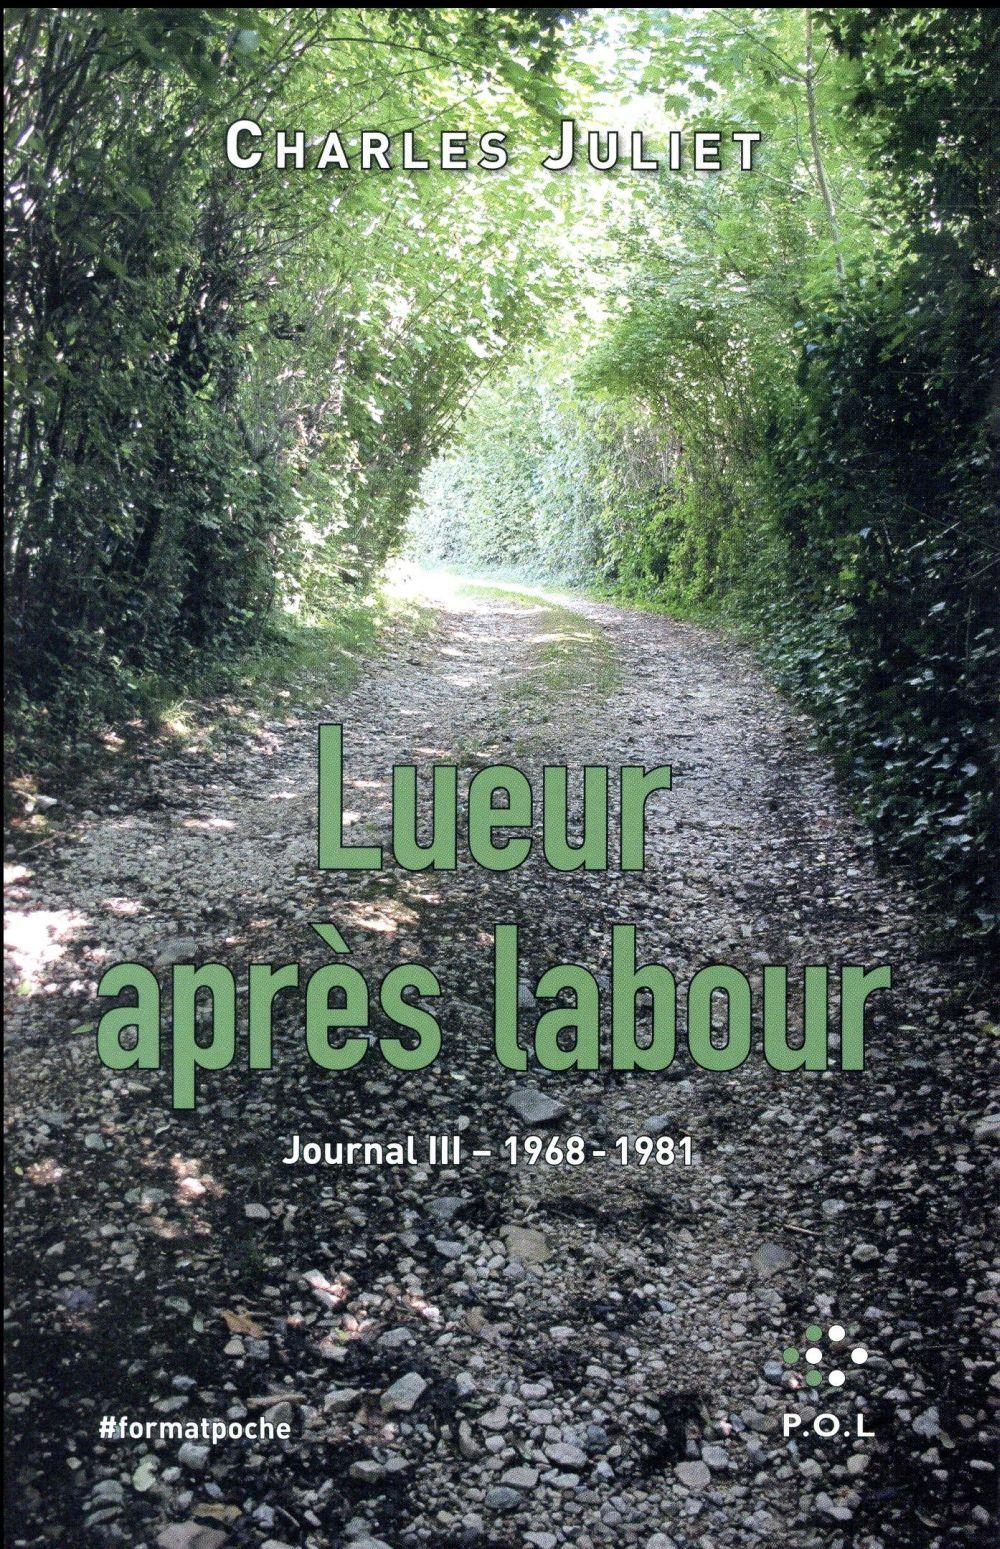 JOURNAL, III : LUEUR APRES LABOUR - (1968-1981)